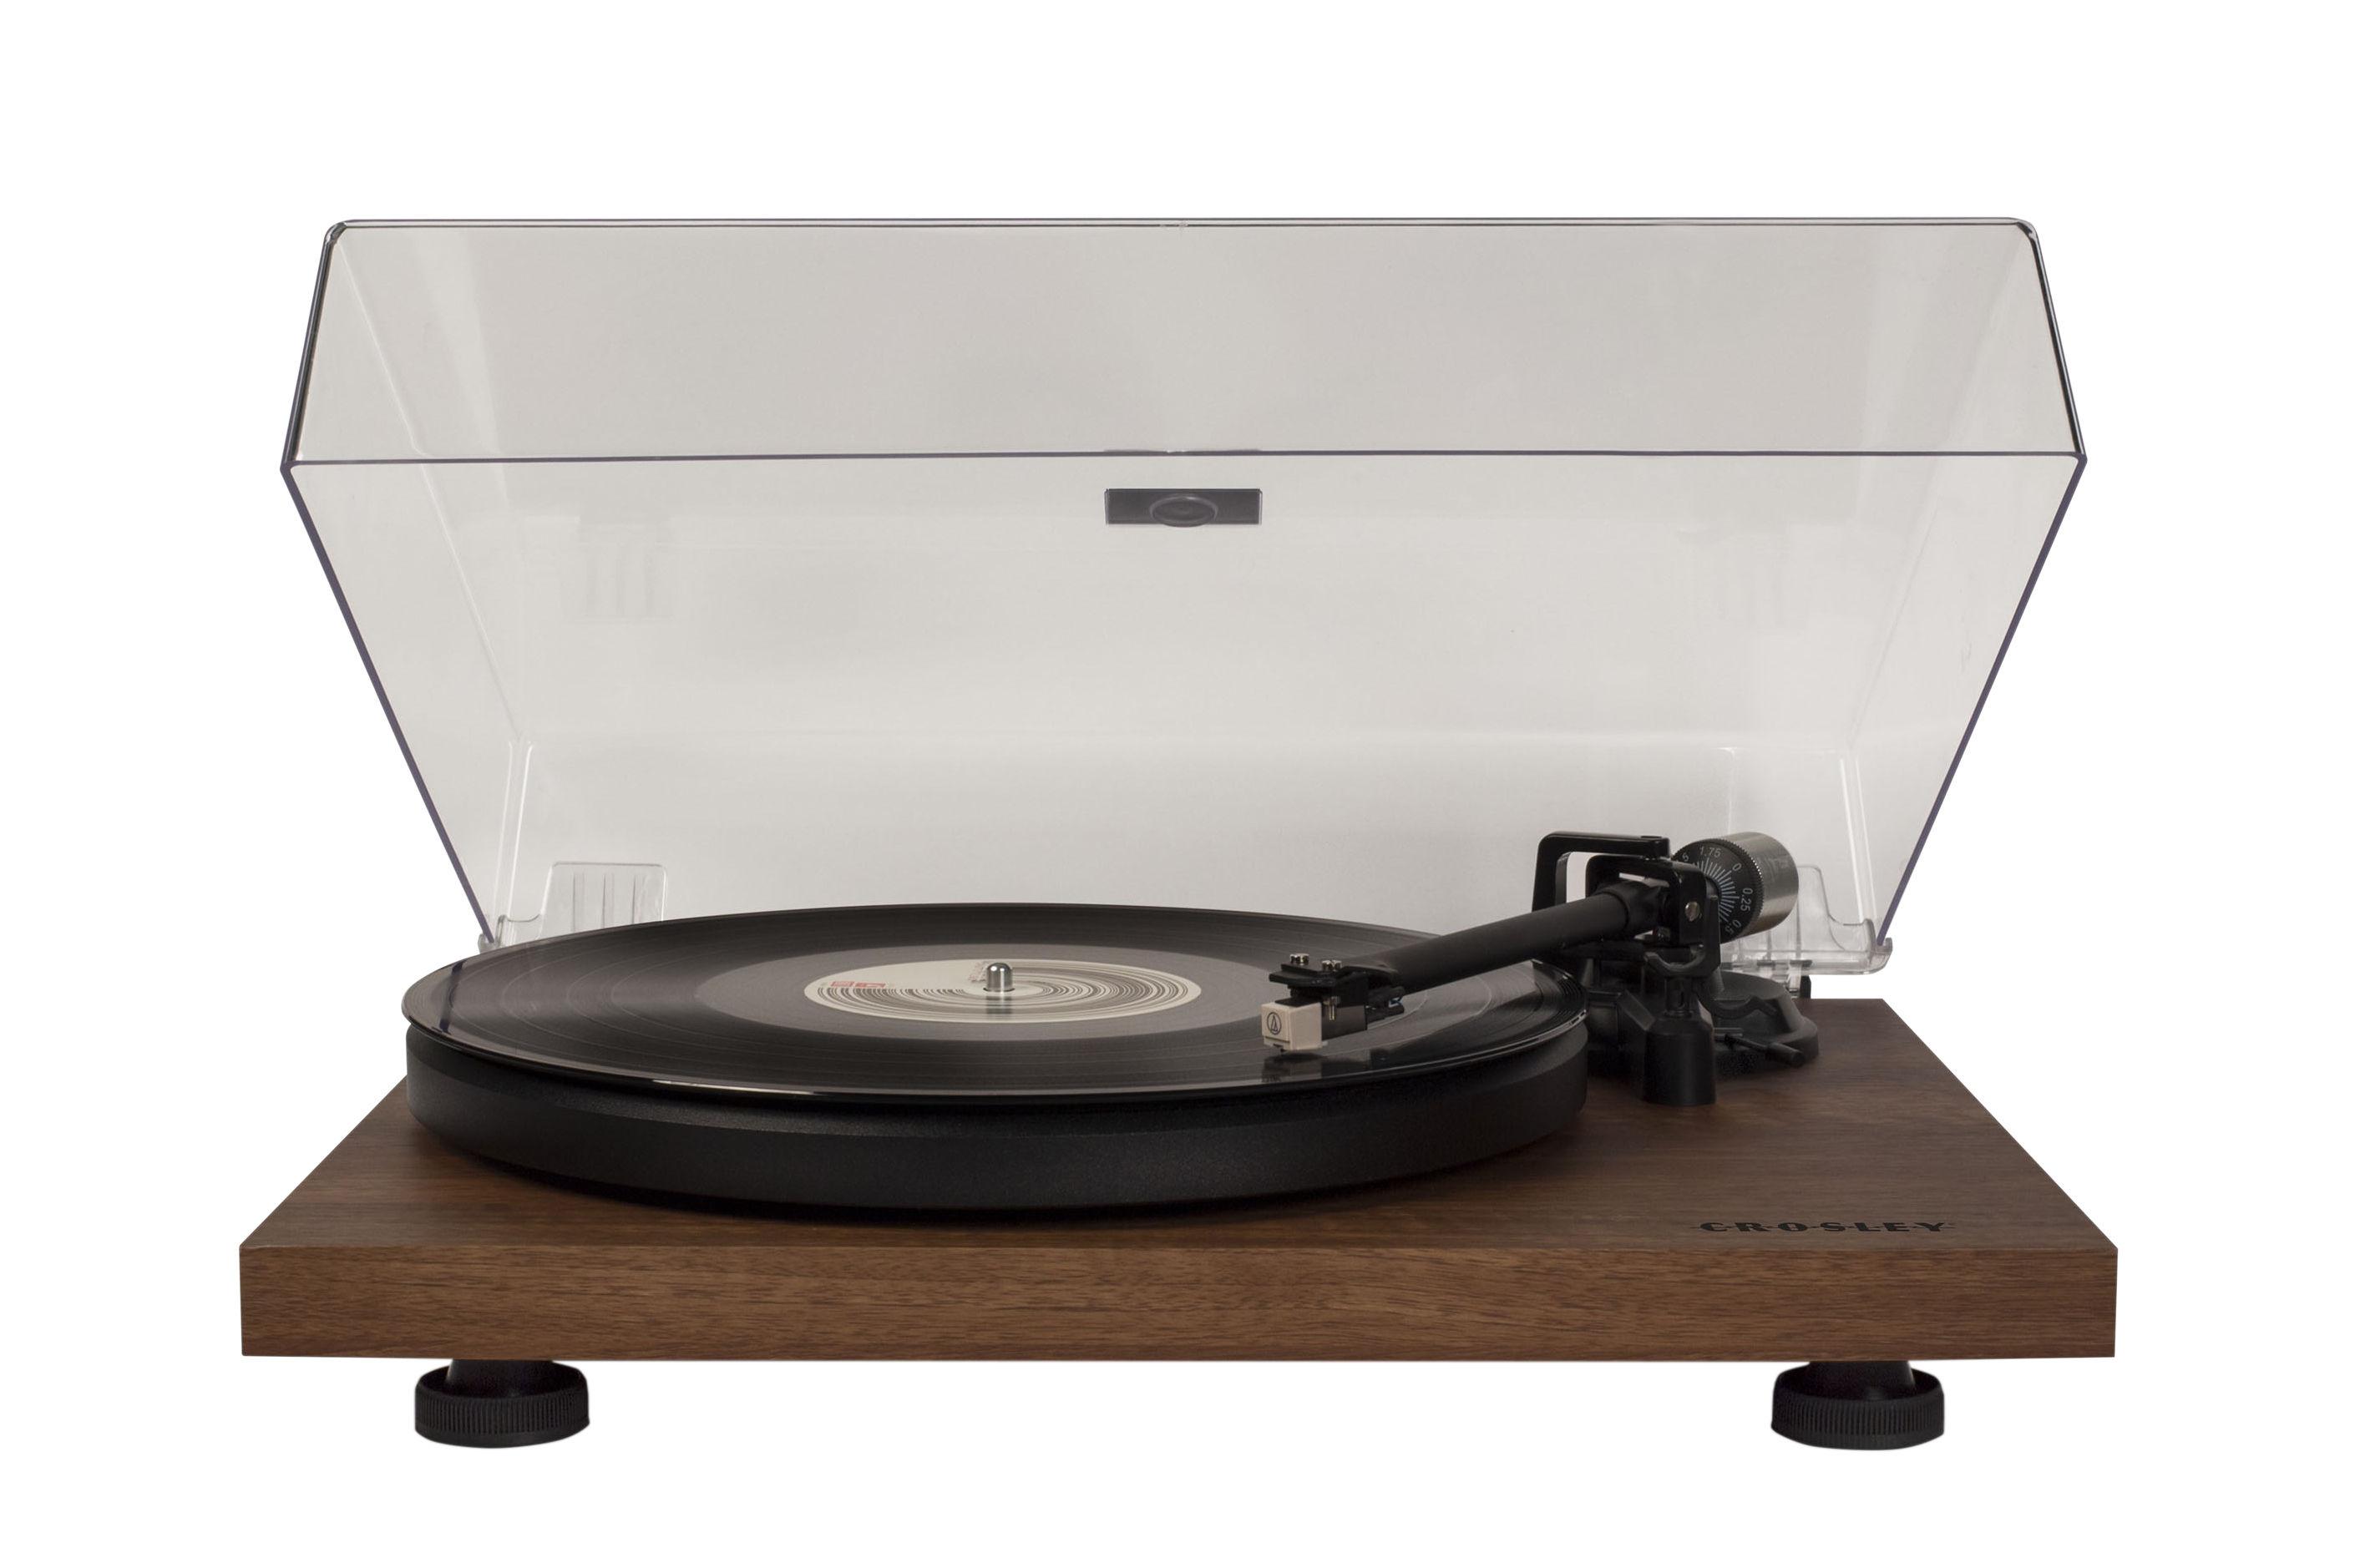 Product selections - Wood, the design fibre - C6 Turntable - / Walnut by Crosley - Walnut - Plastic, Steel, Walnut plated MDF